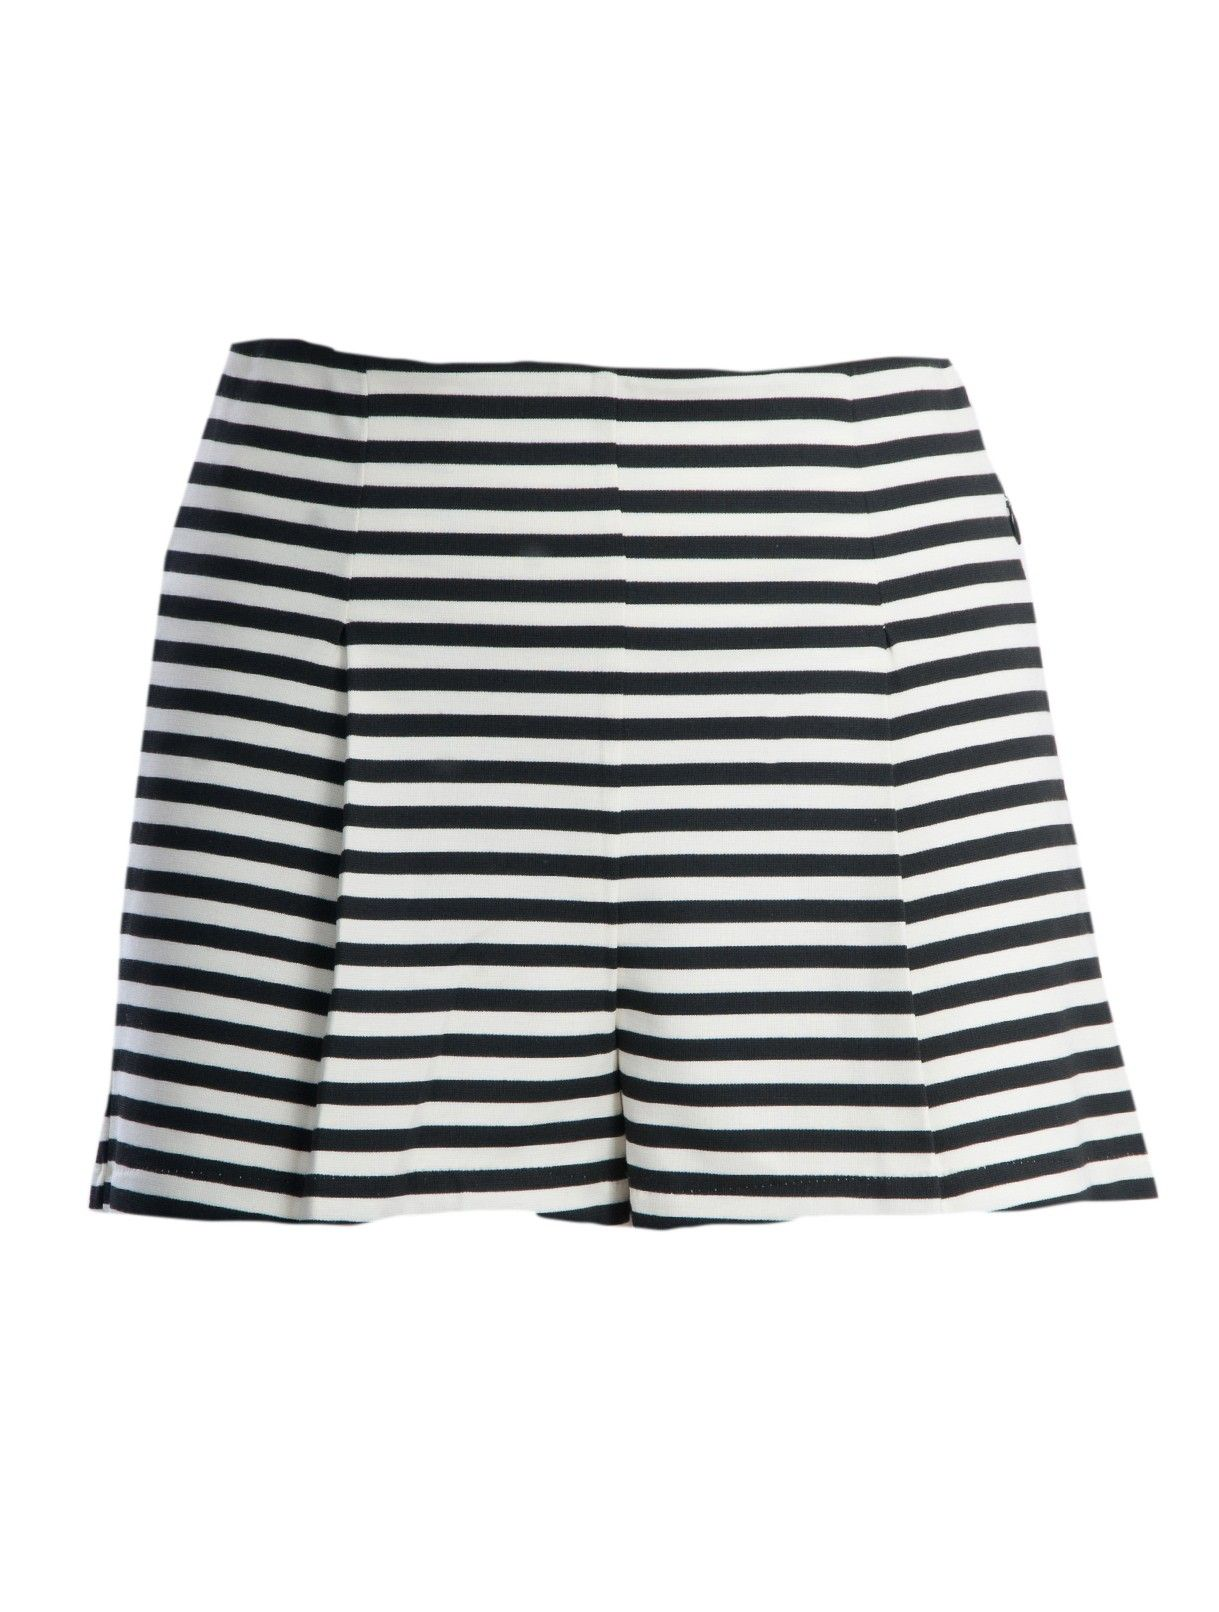 5 KEY PIECES para este Verano:  #2 Shorts | Black and White Shorts en www.styleto.co